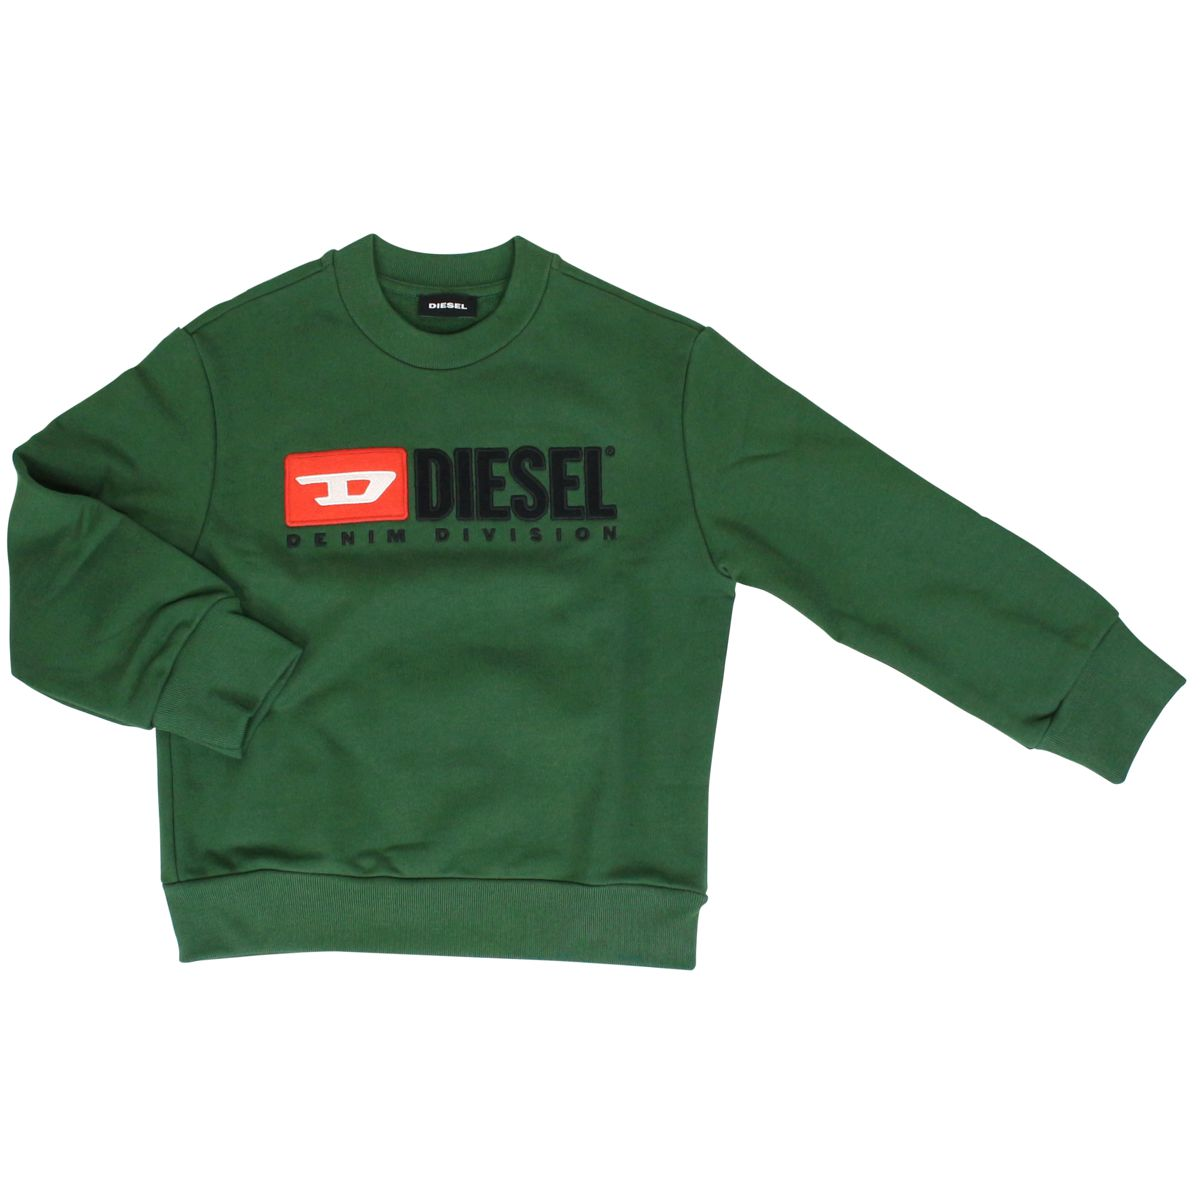 35bc5551 Crew-neck cotton sweatshirt with logo patch